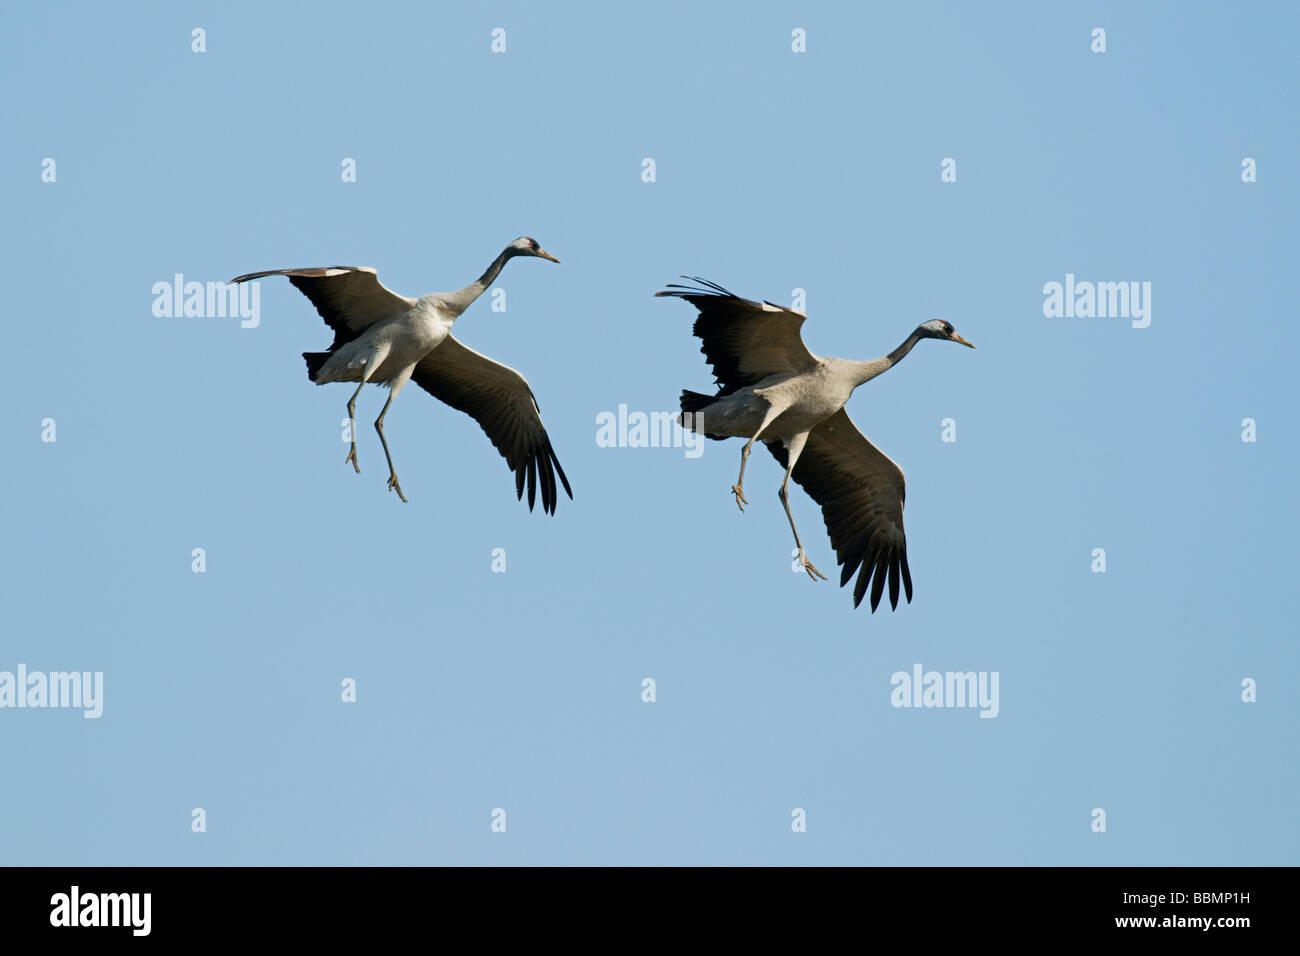 Common Crane (Grus grus), flying couple, Lake Hornborga, Vaestergoetland, Sweden, Scandinavia, Europe Stock Photo